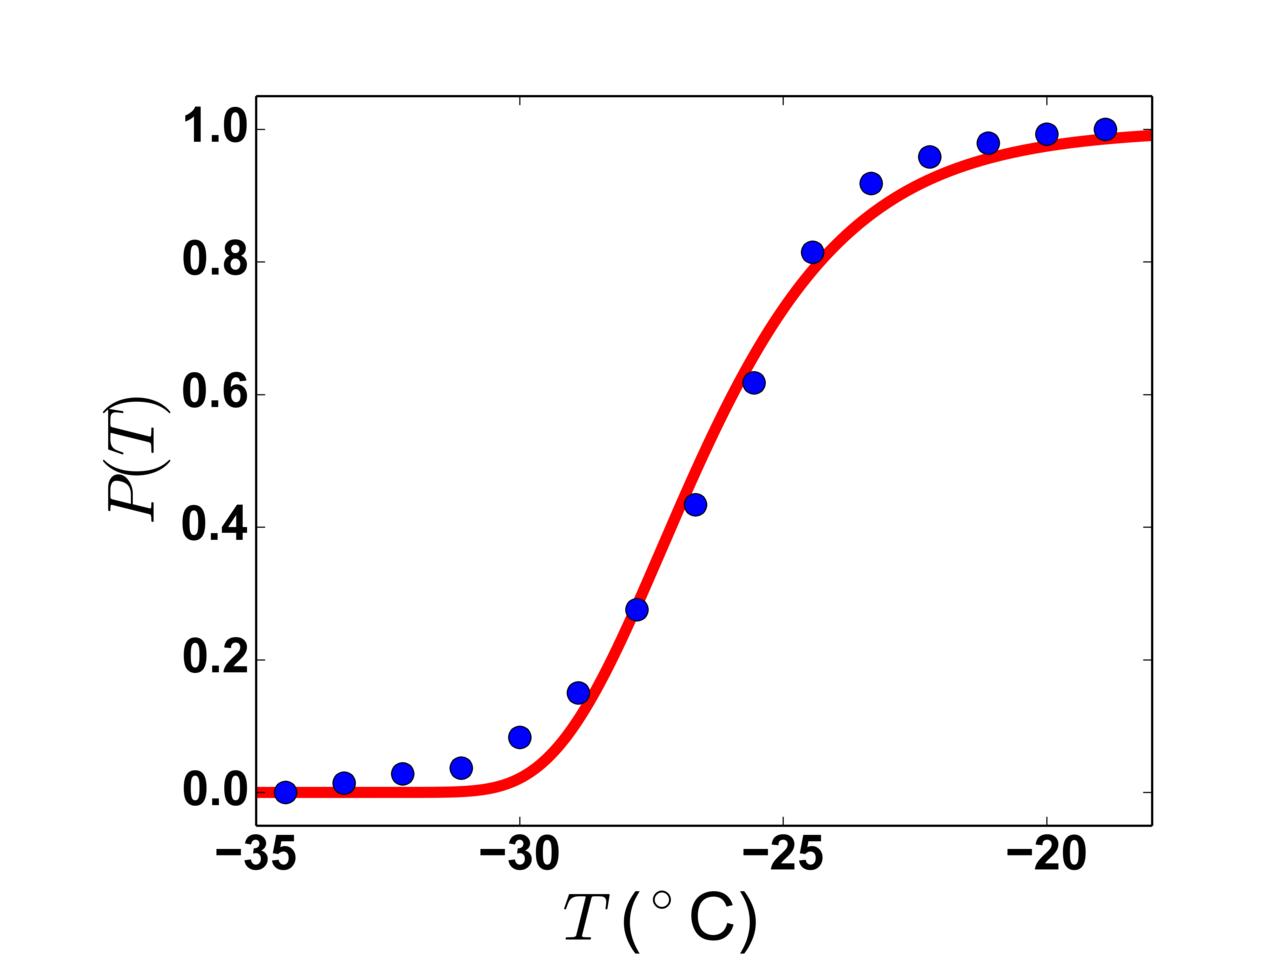 File:Survival curve 34.5 micrometre water droplets 1950